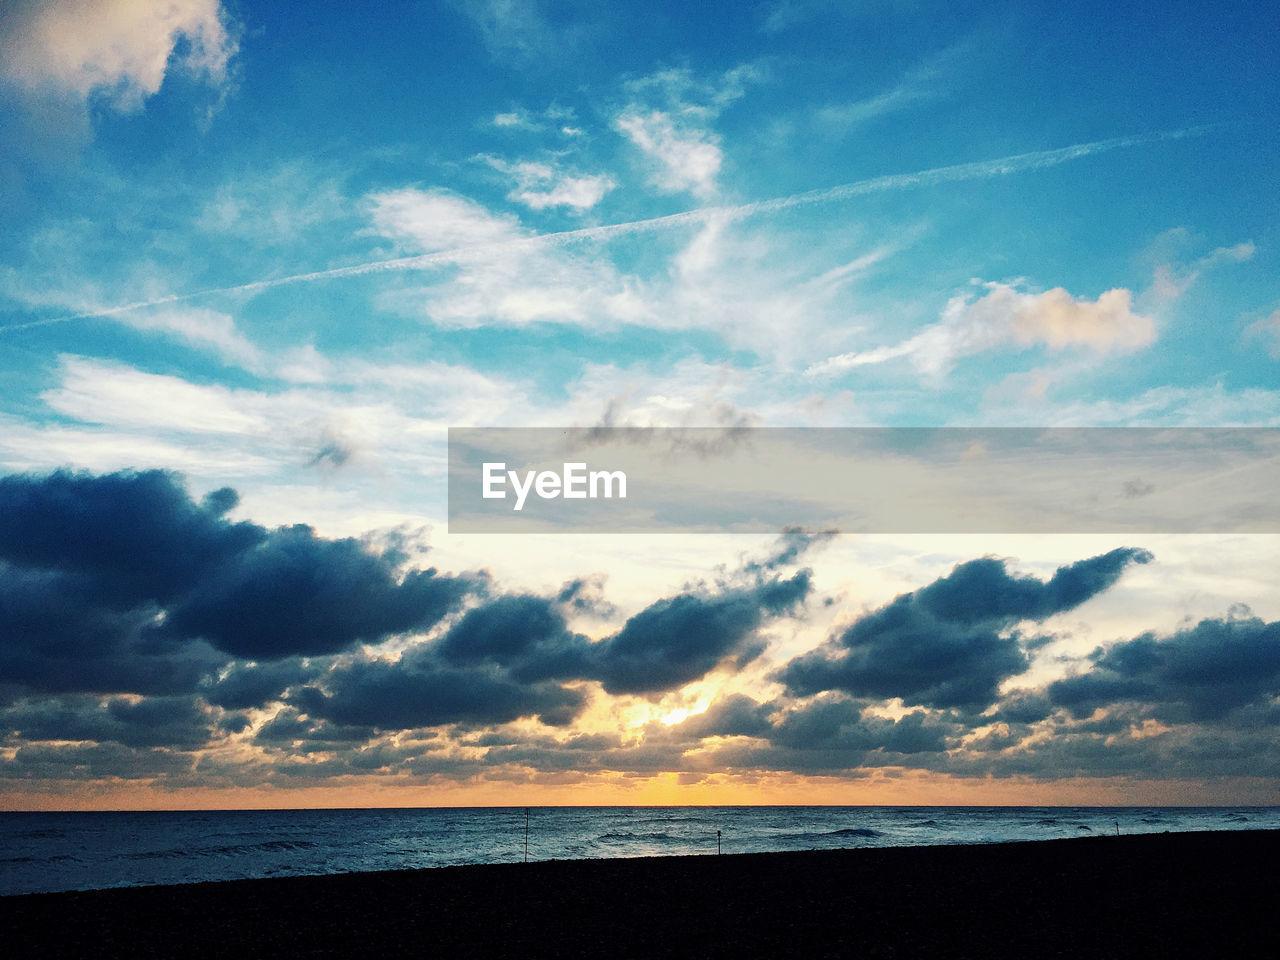 sky, cloud - sky, beauty in nature, horizon, sea, scenics - nature, horizon over water, tranquility, tranquil scene, water, land, nature, beach, sunset, no people, outdoors, idyllic, blue, non-urban scene